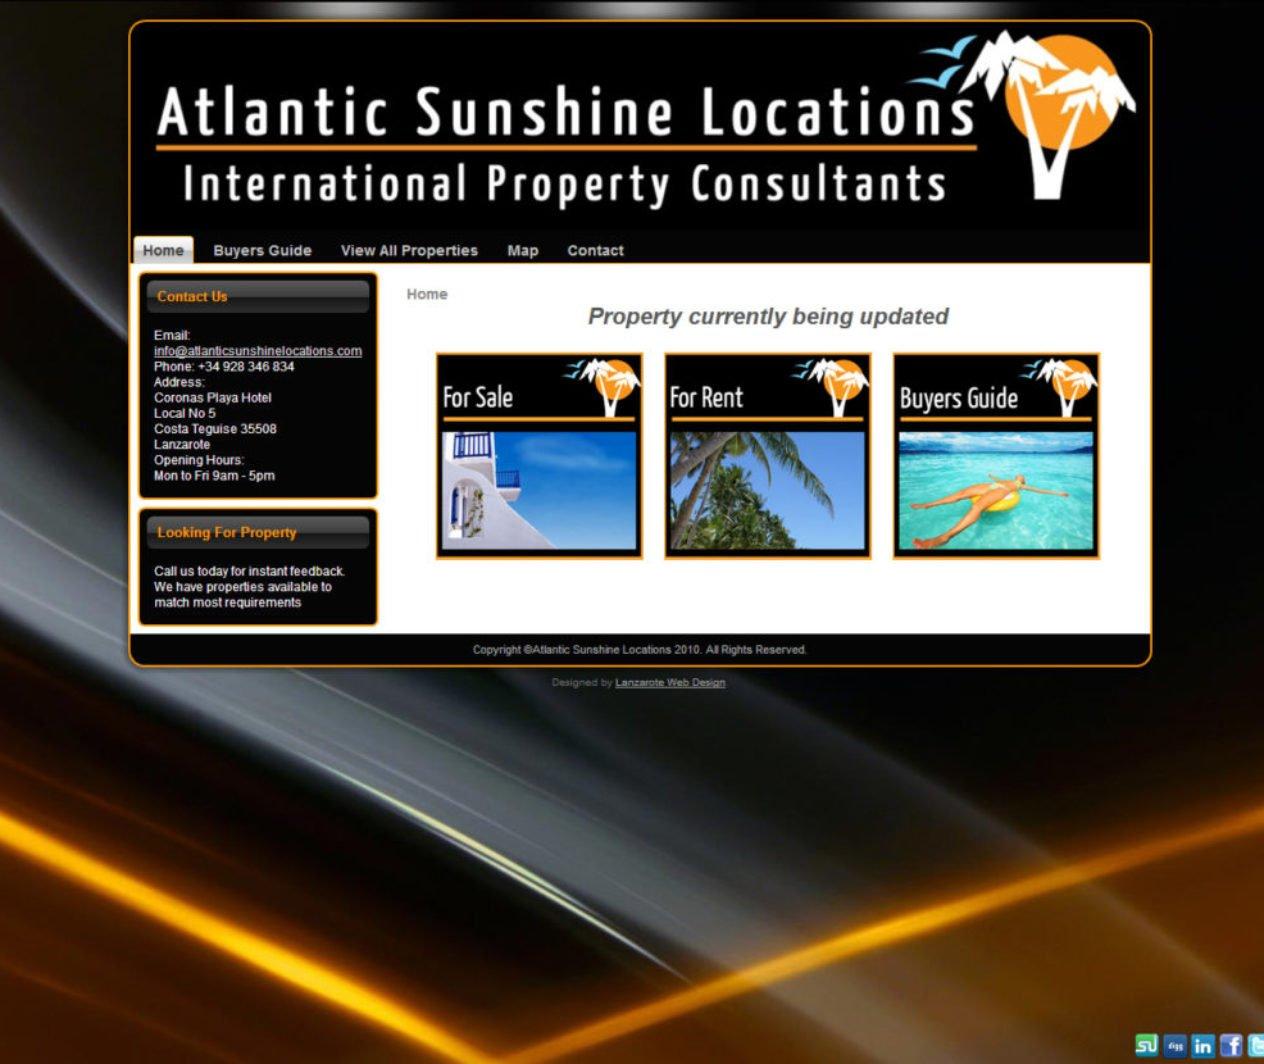 Atlantic Sunshine Locations